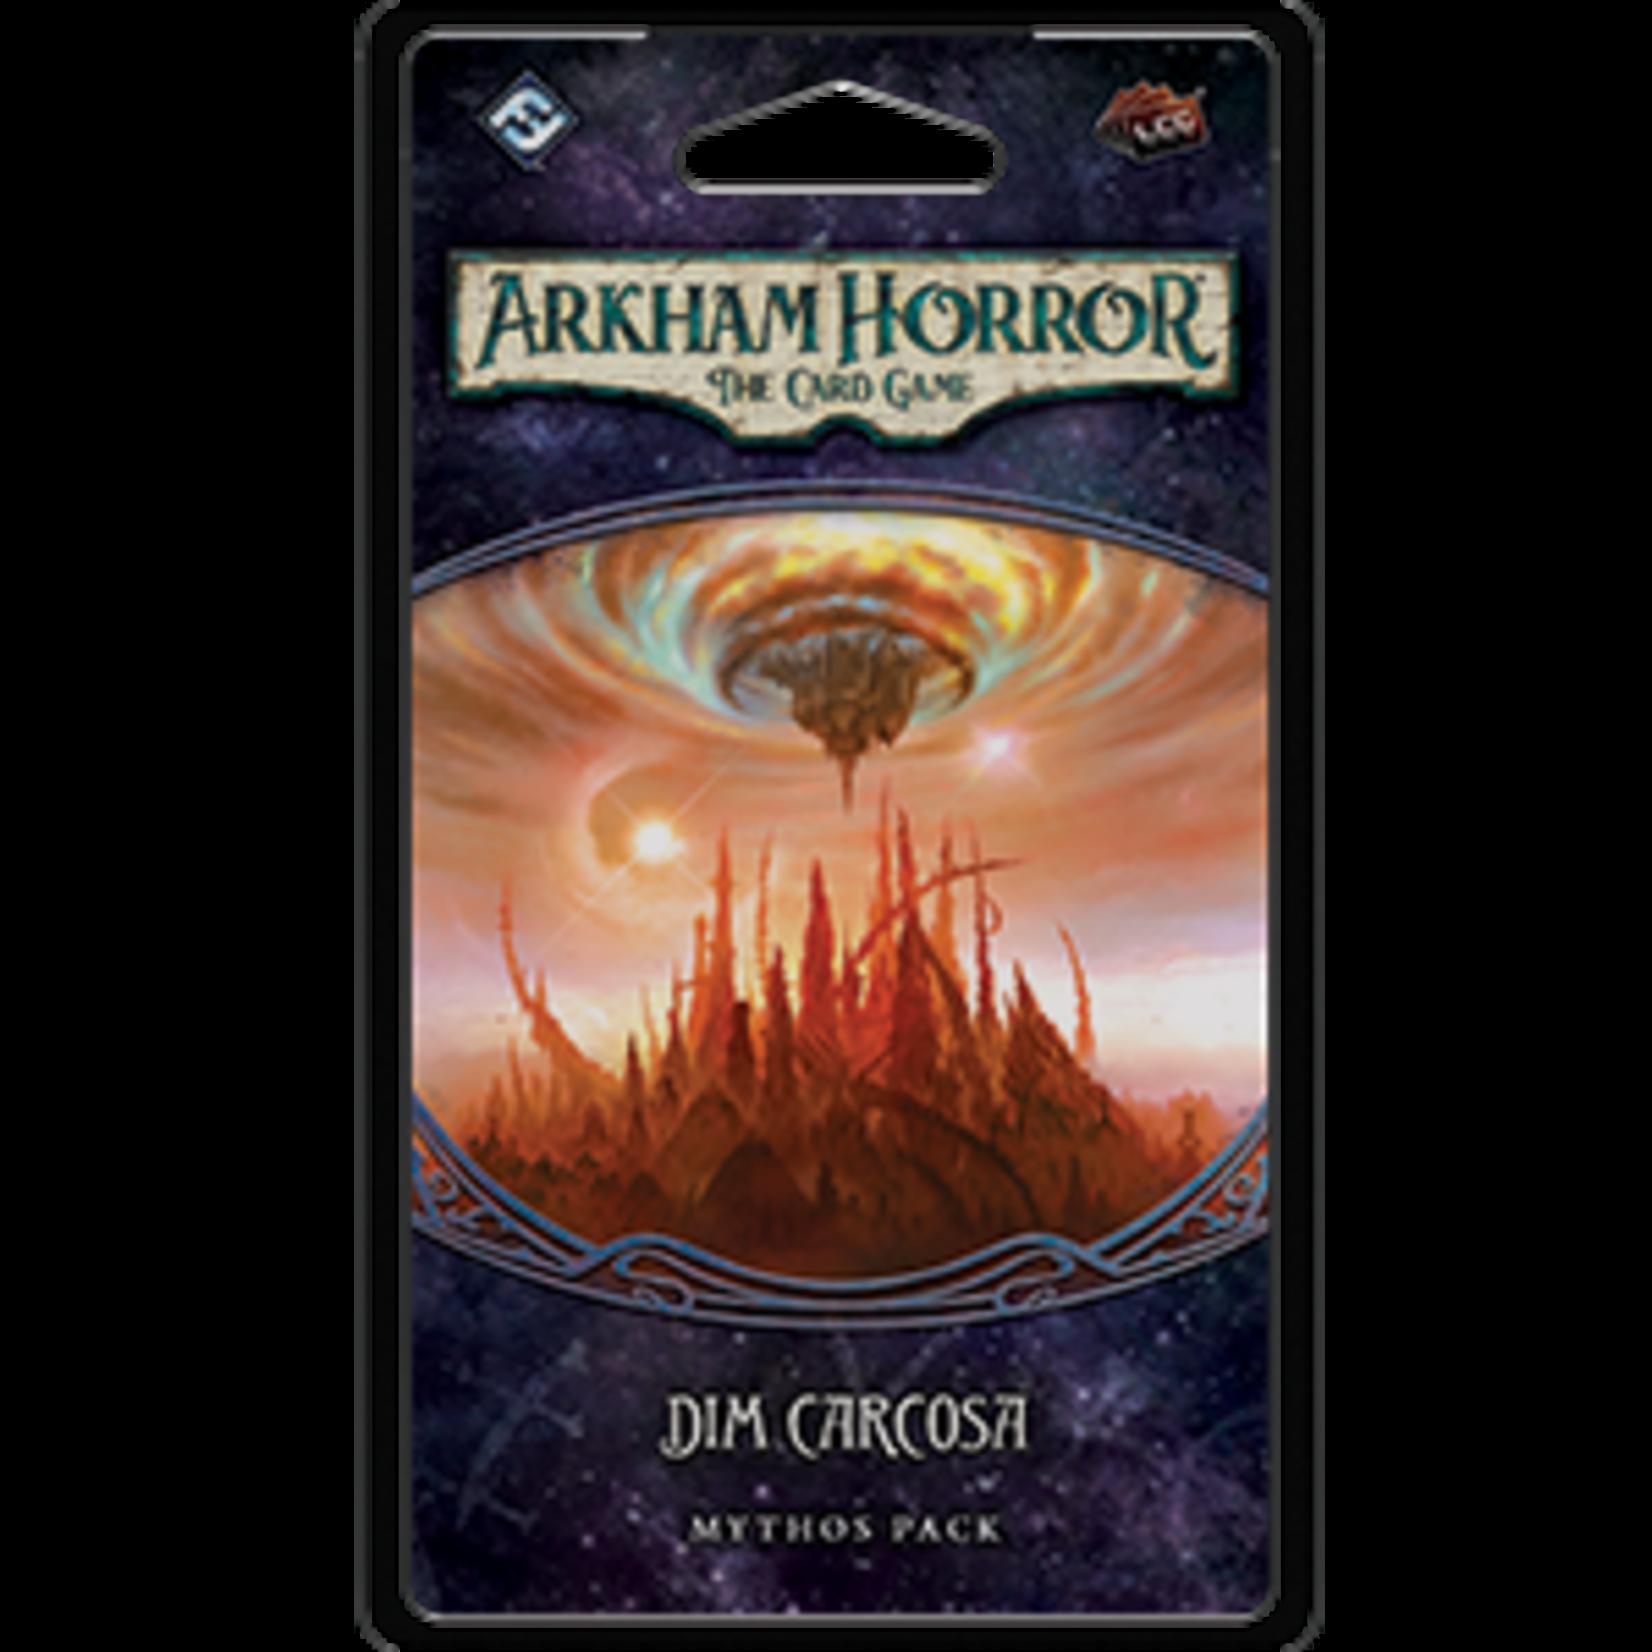 Fantasy Flight Games Arkham Horror LCG: Dim Carcosa Mythos Pack (Path to Carcosa 6)